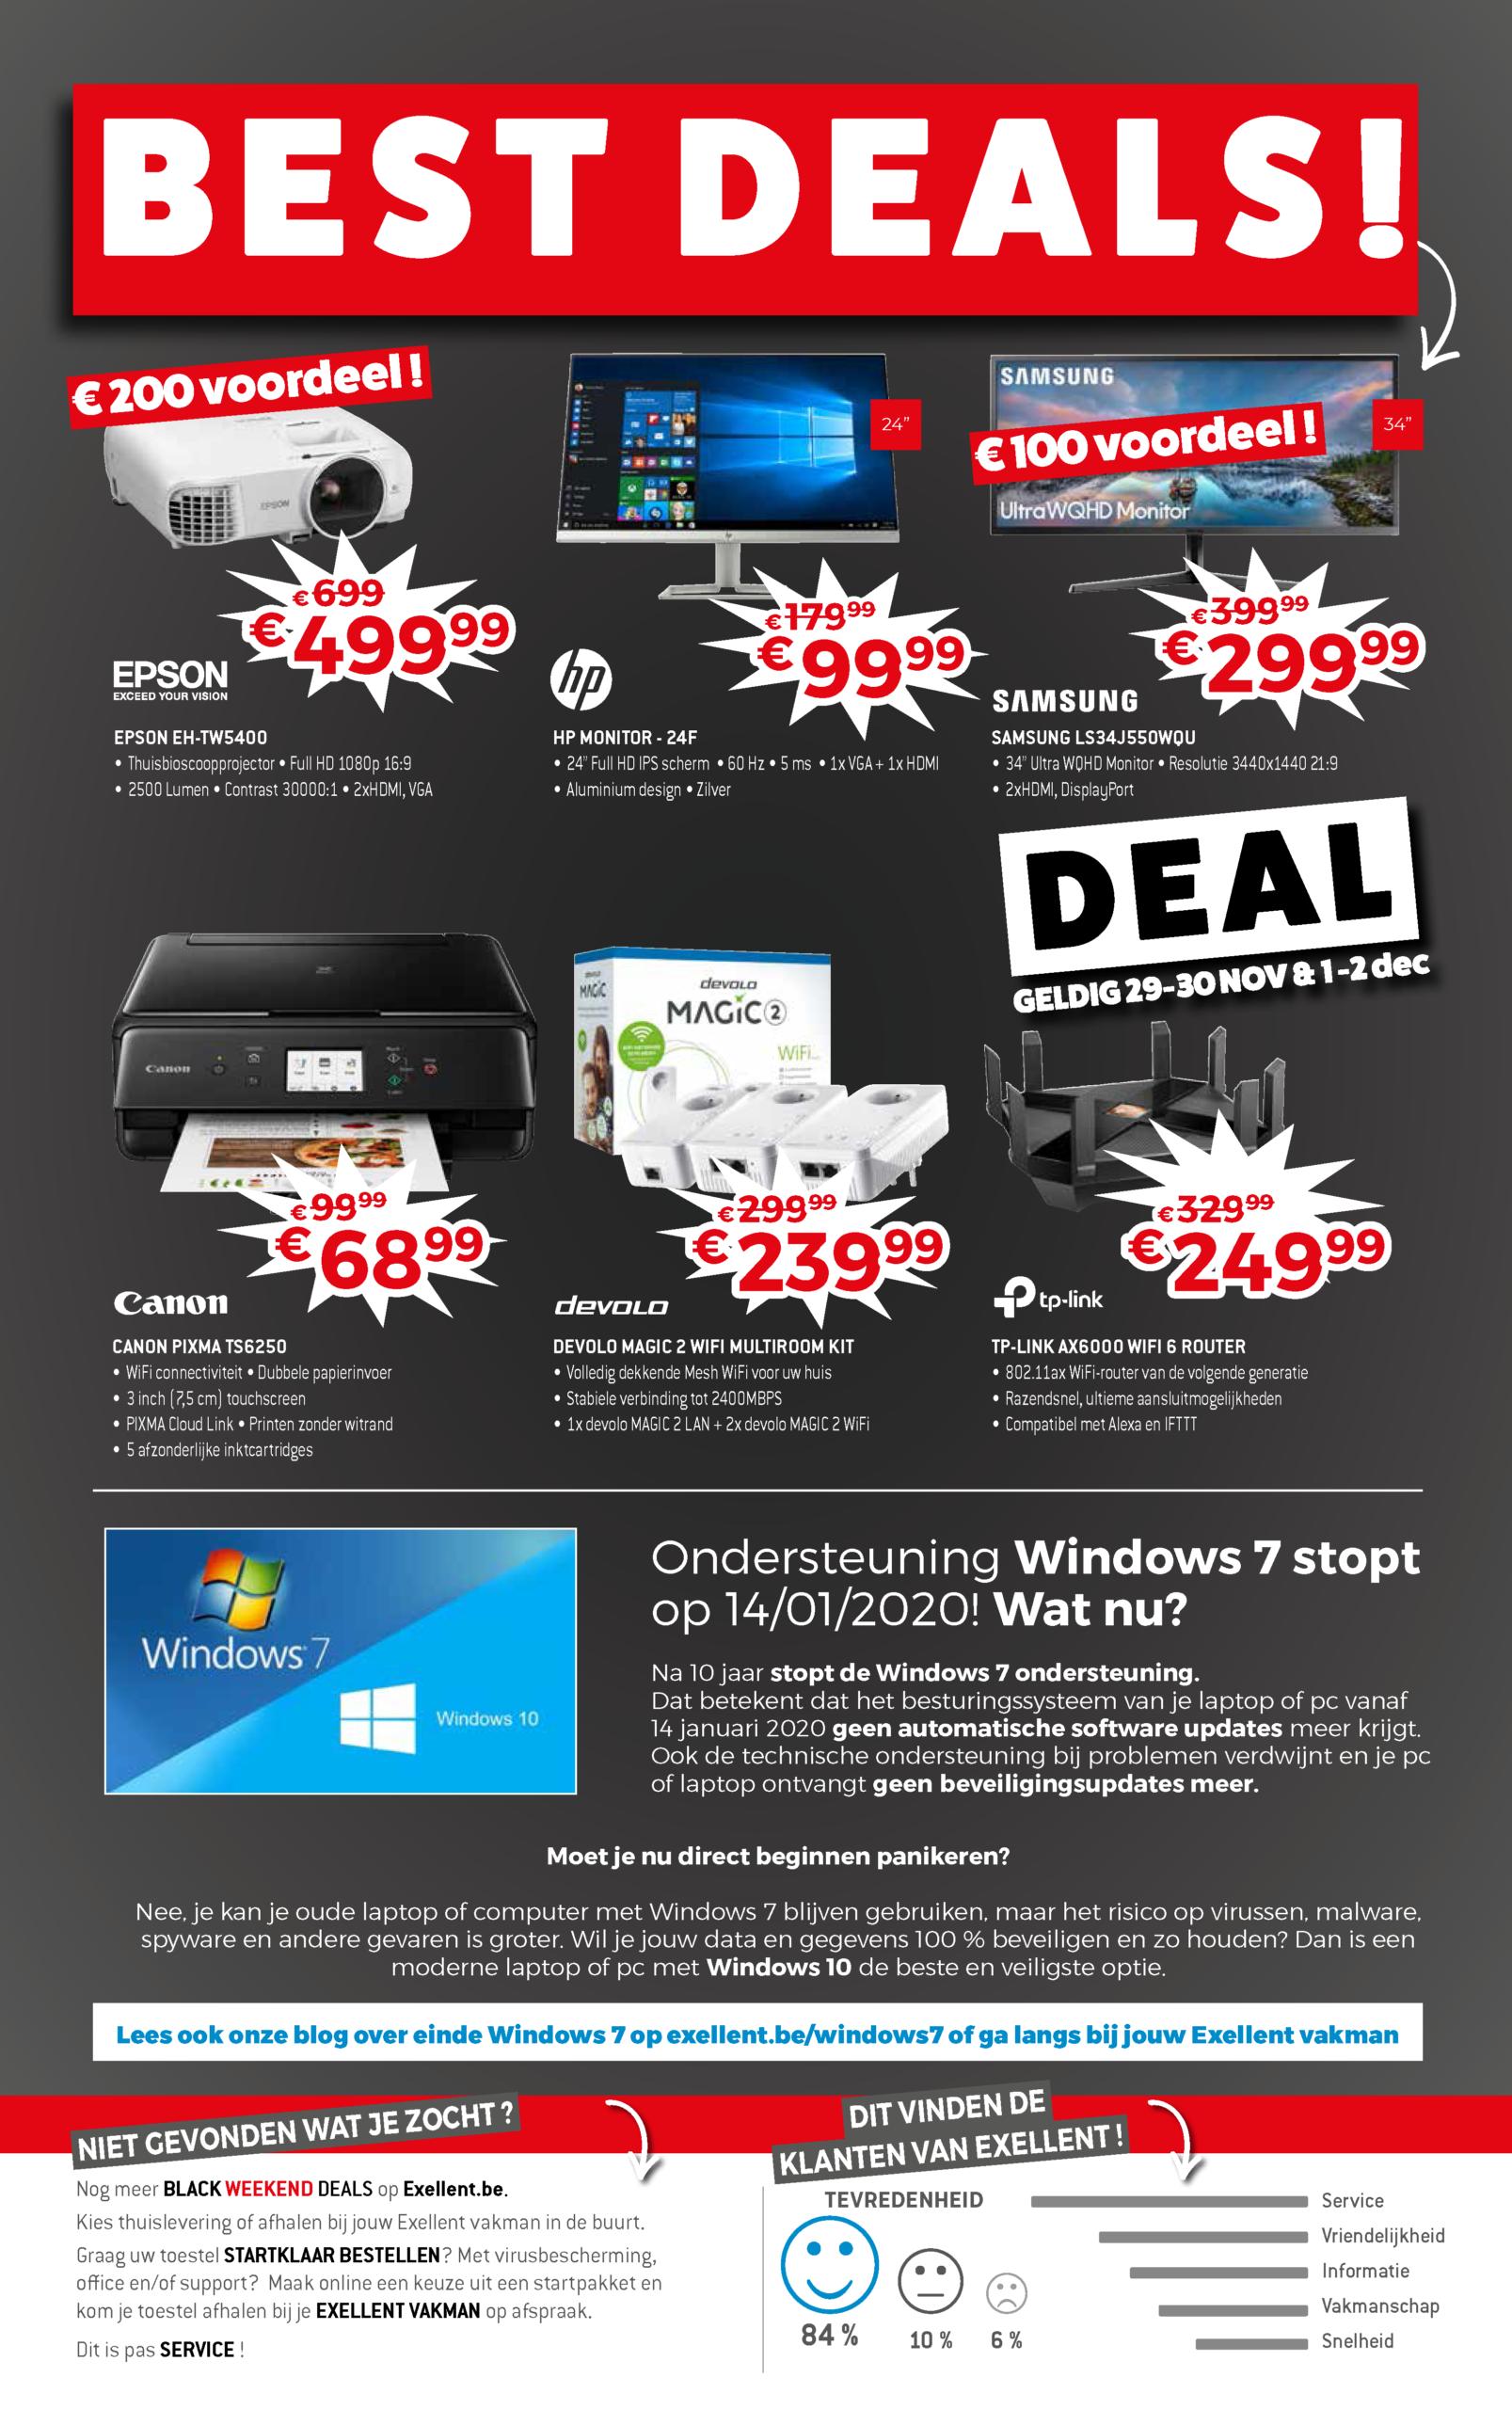 Marcelis Black friday 2019 deals it smart office belgie computer laptop print halle shop kortingen